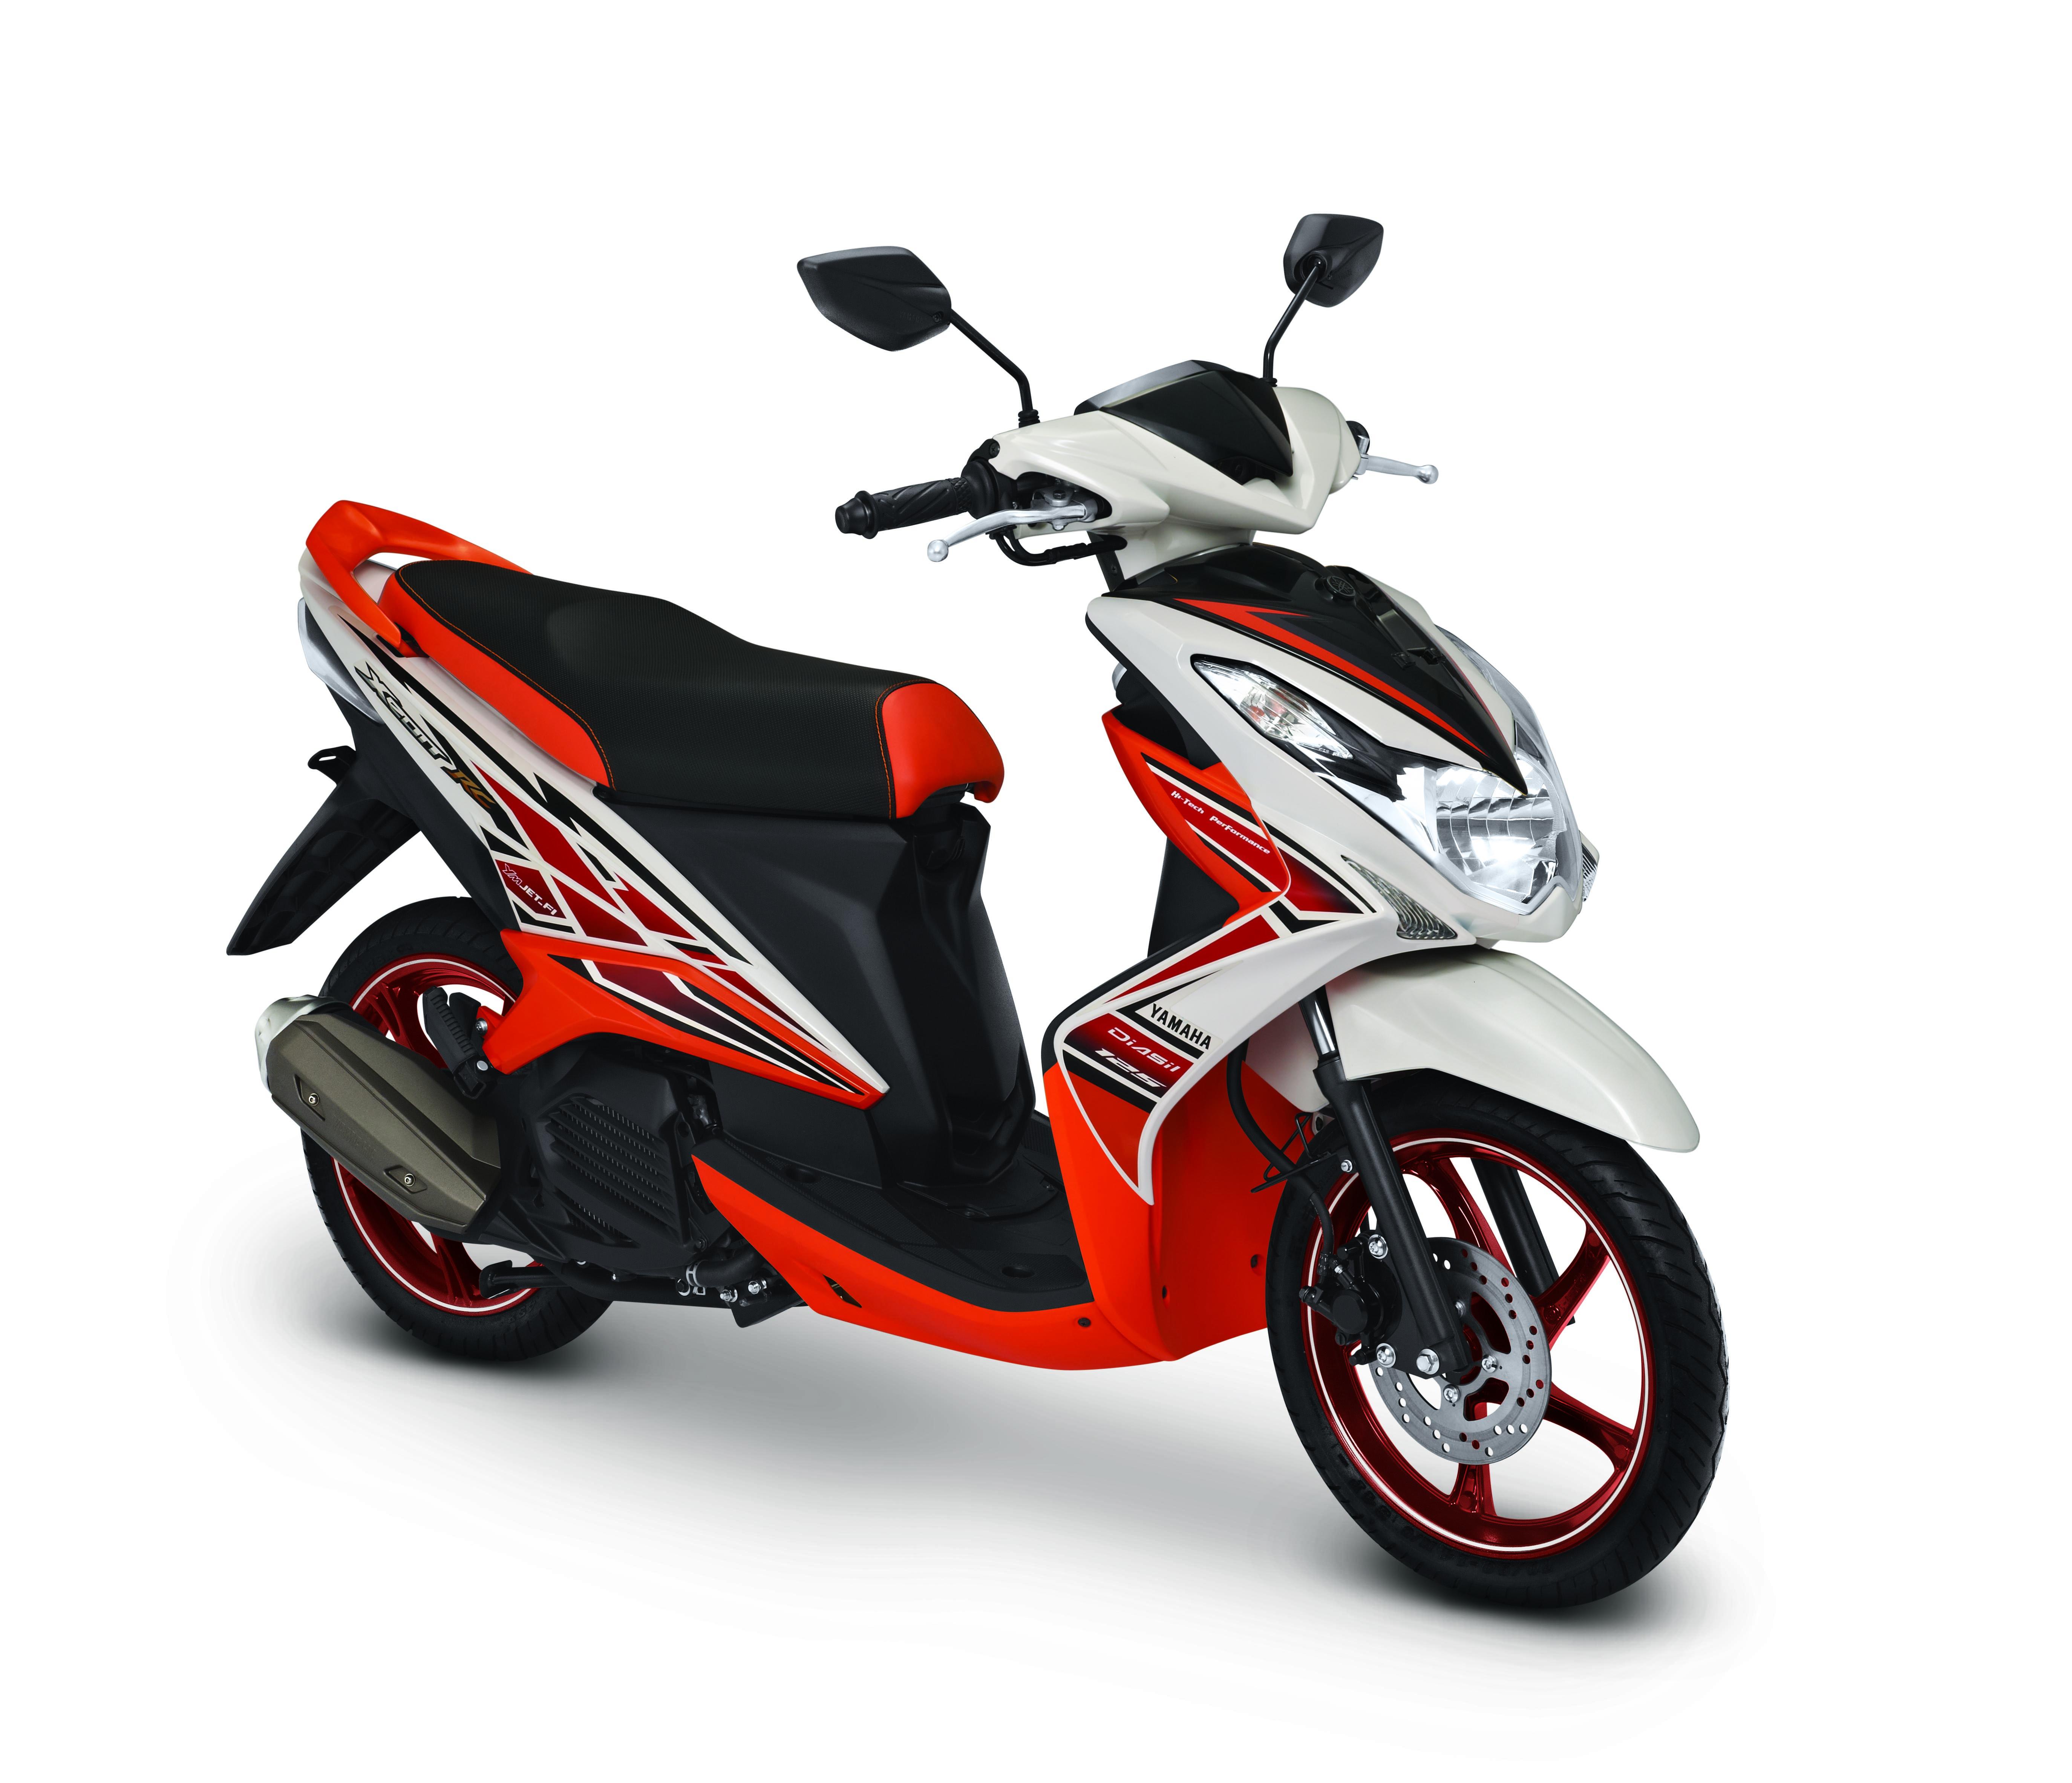 Harga Yamaha Lexi 2020 Spesifikasi Warna Terbaru Otomotifo